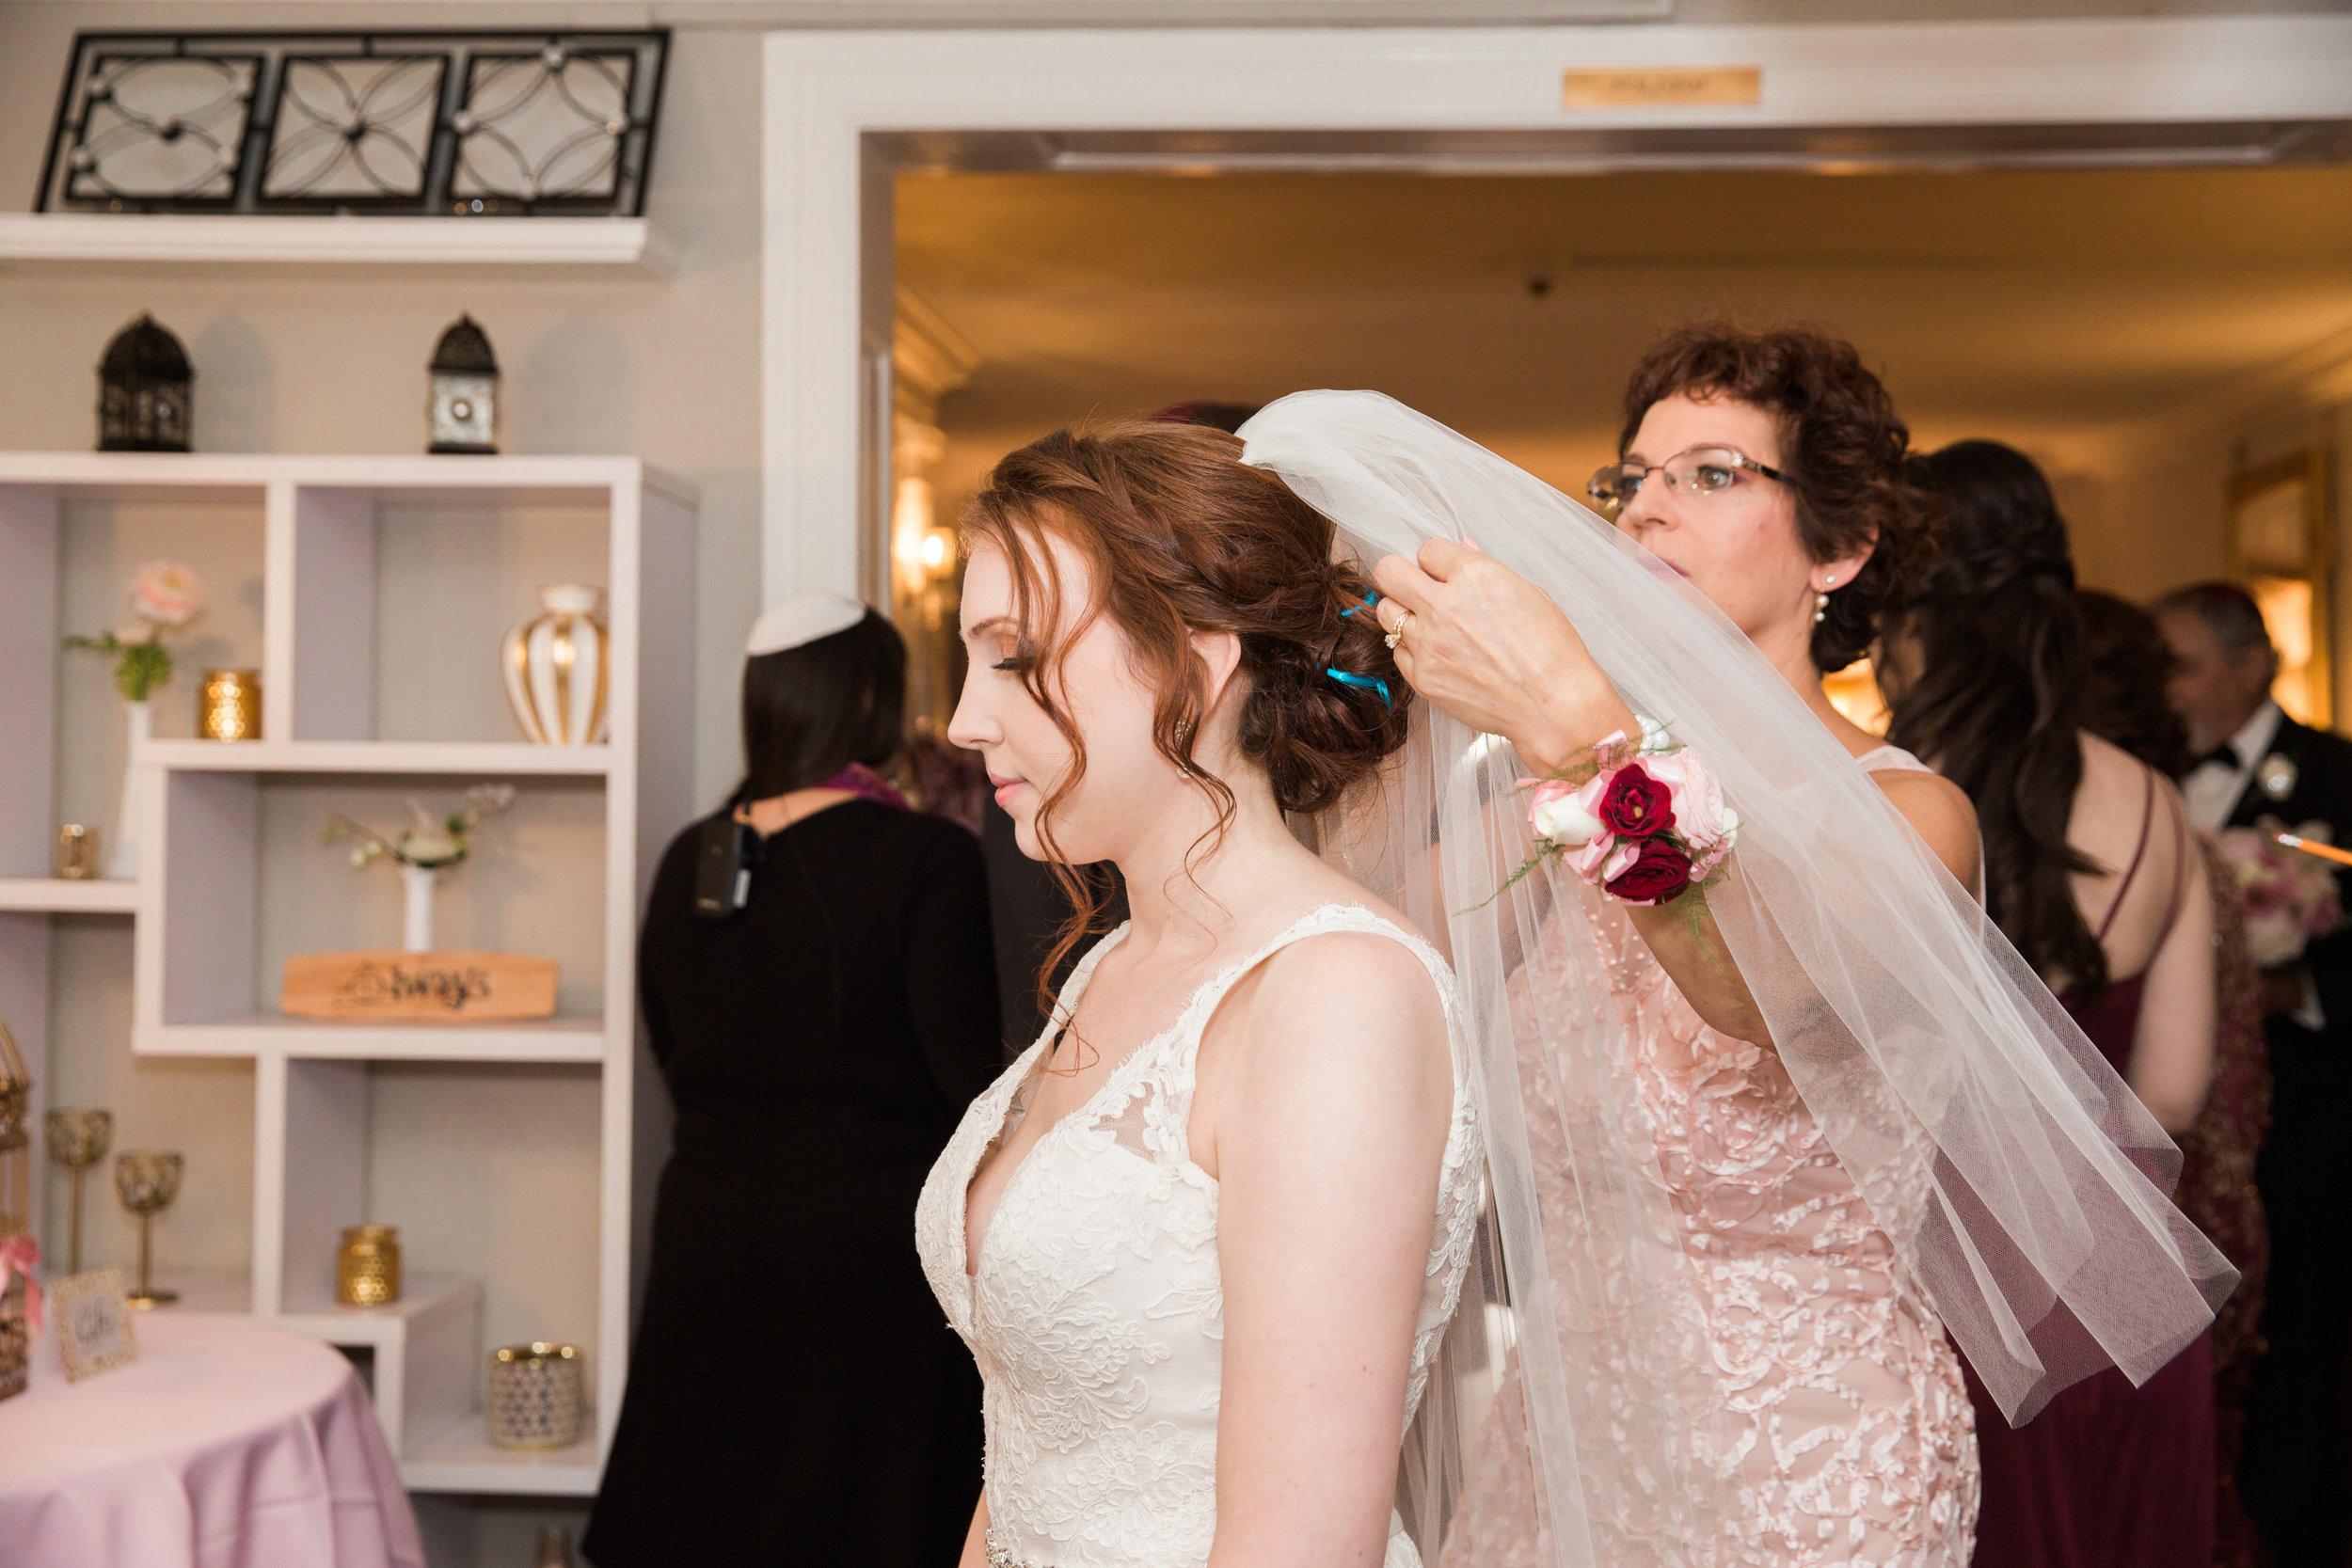 Harry Potter Wedding at Overhills Mansion Catonville Maryland Wedding Photographers Megapixels Media (66 of 134).jpg